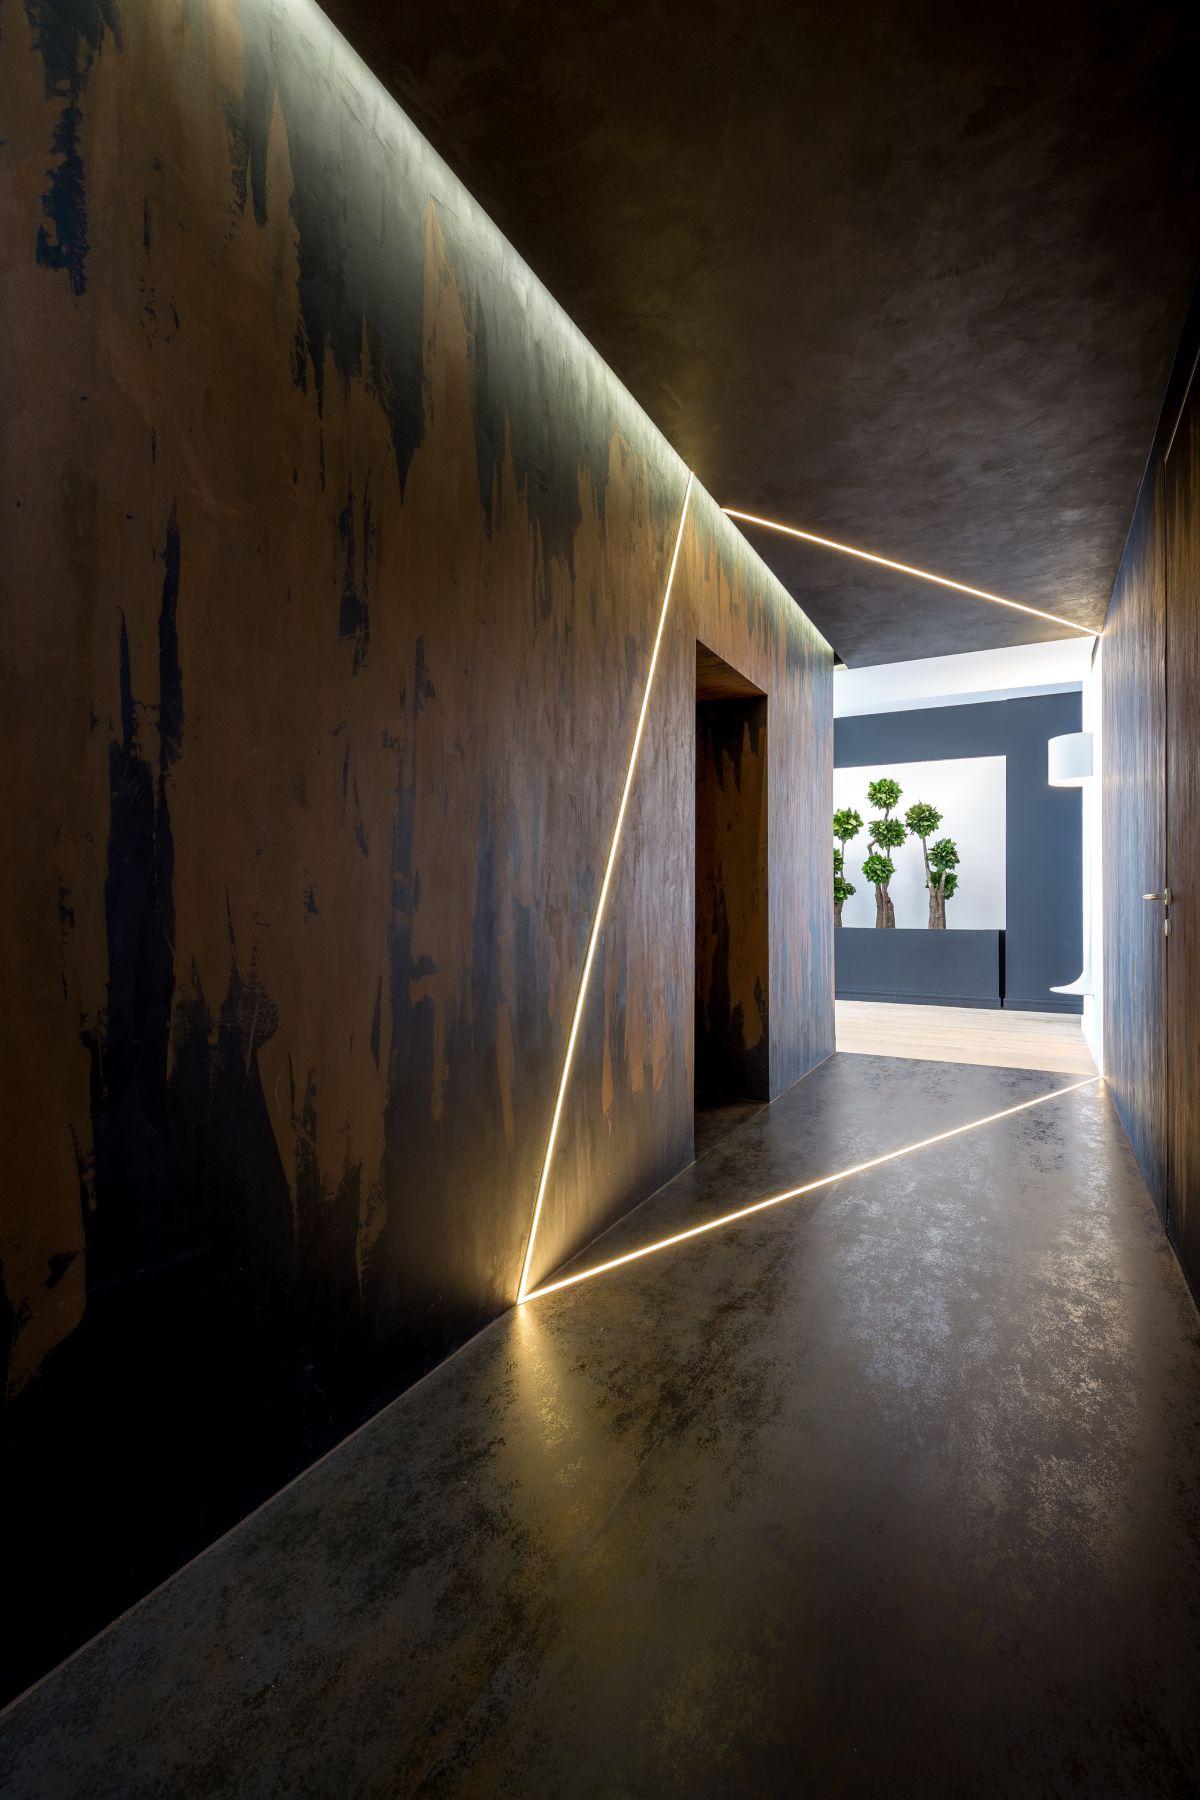 An unusual, dark entryway creates drama as people enter the apartment.